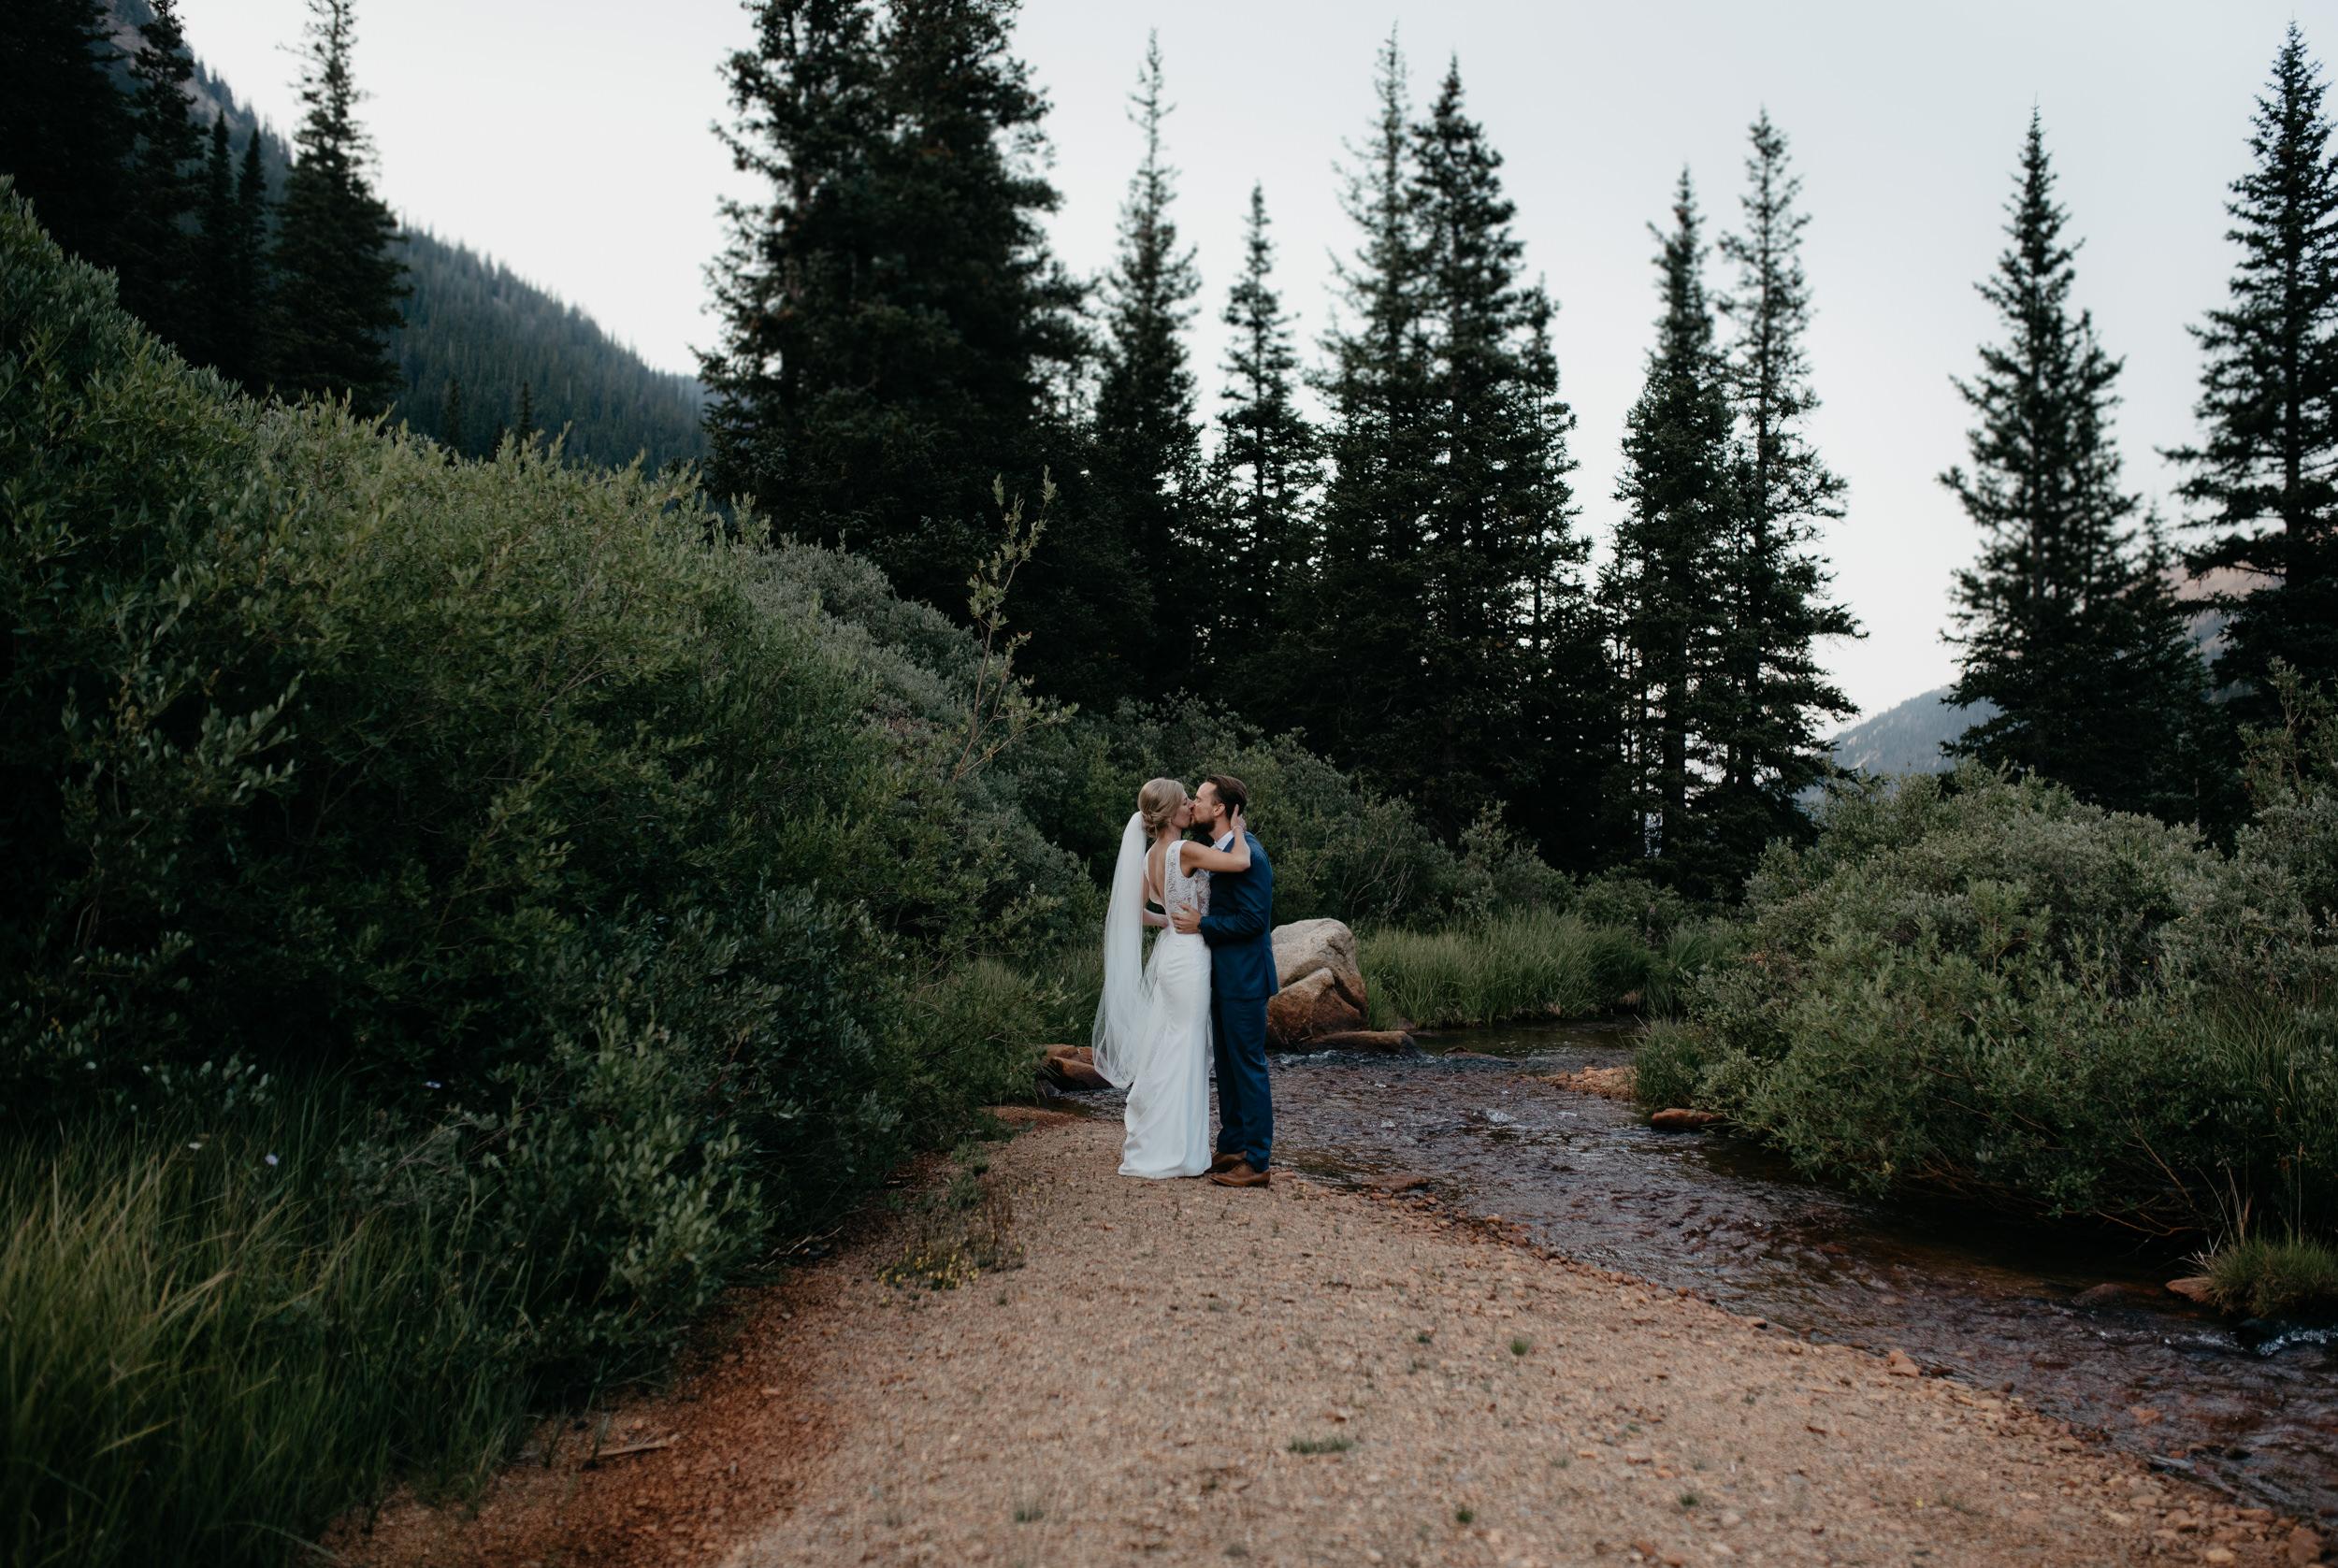 Colorado elopement at Guanella Pass. Colorado adventure wedding photographer.